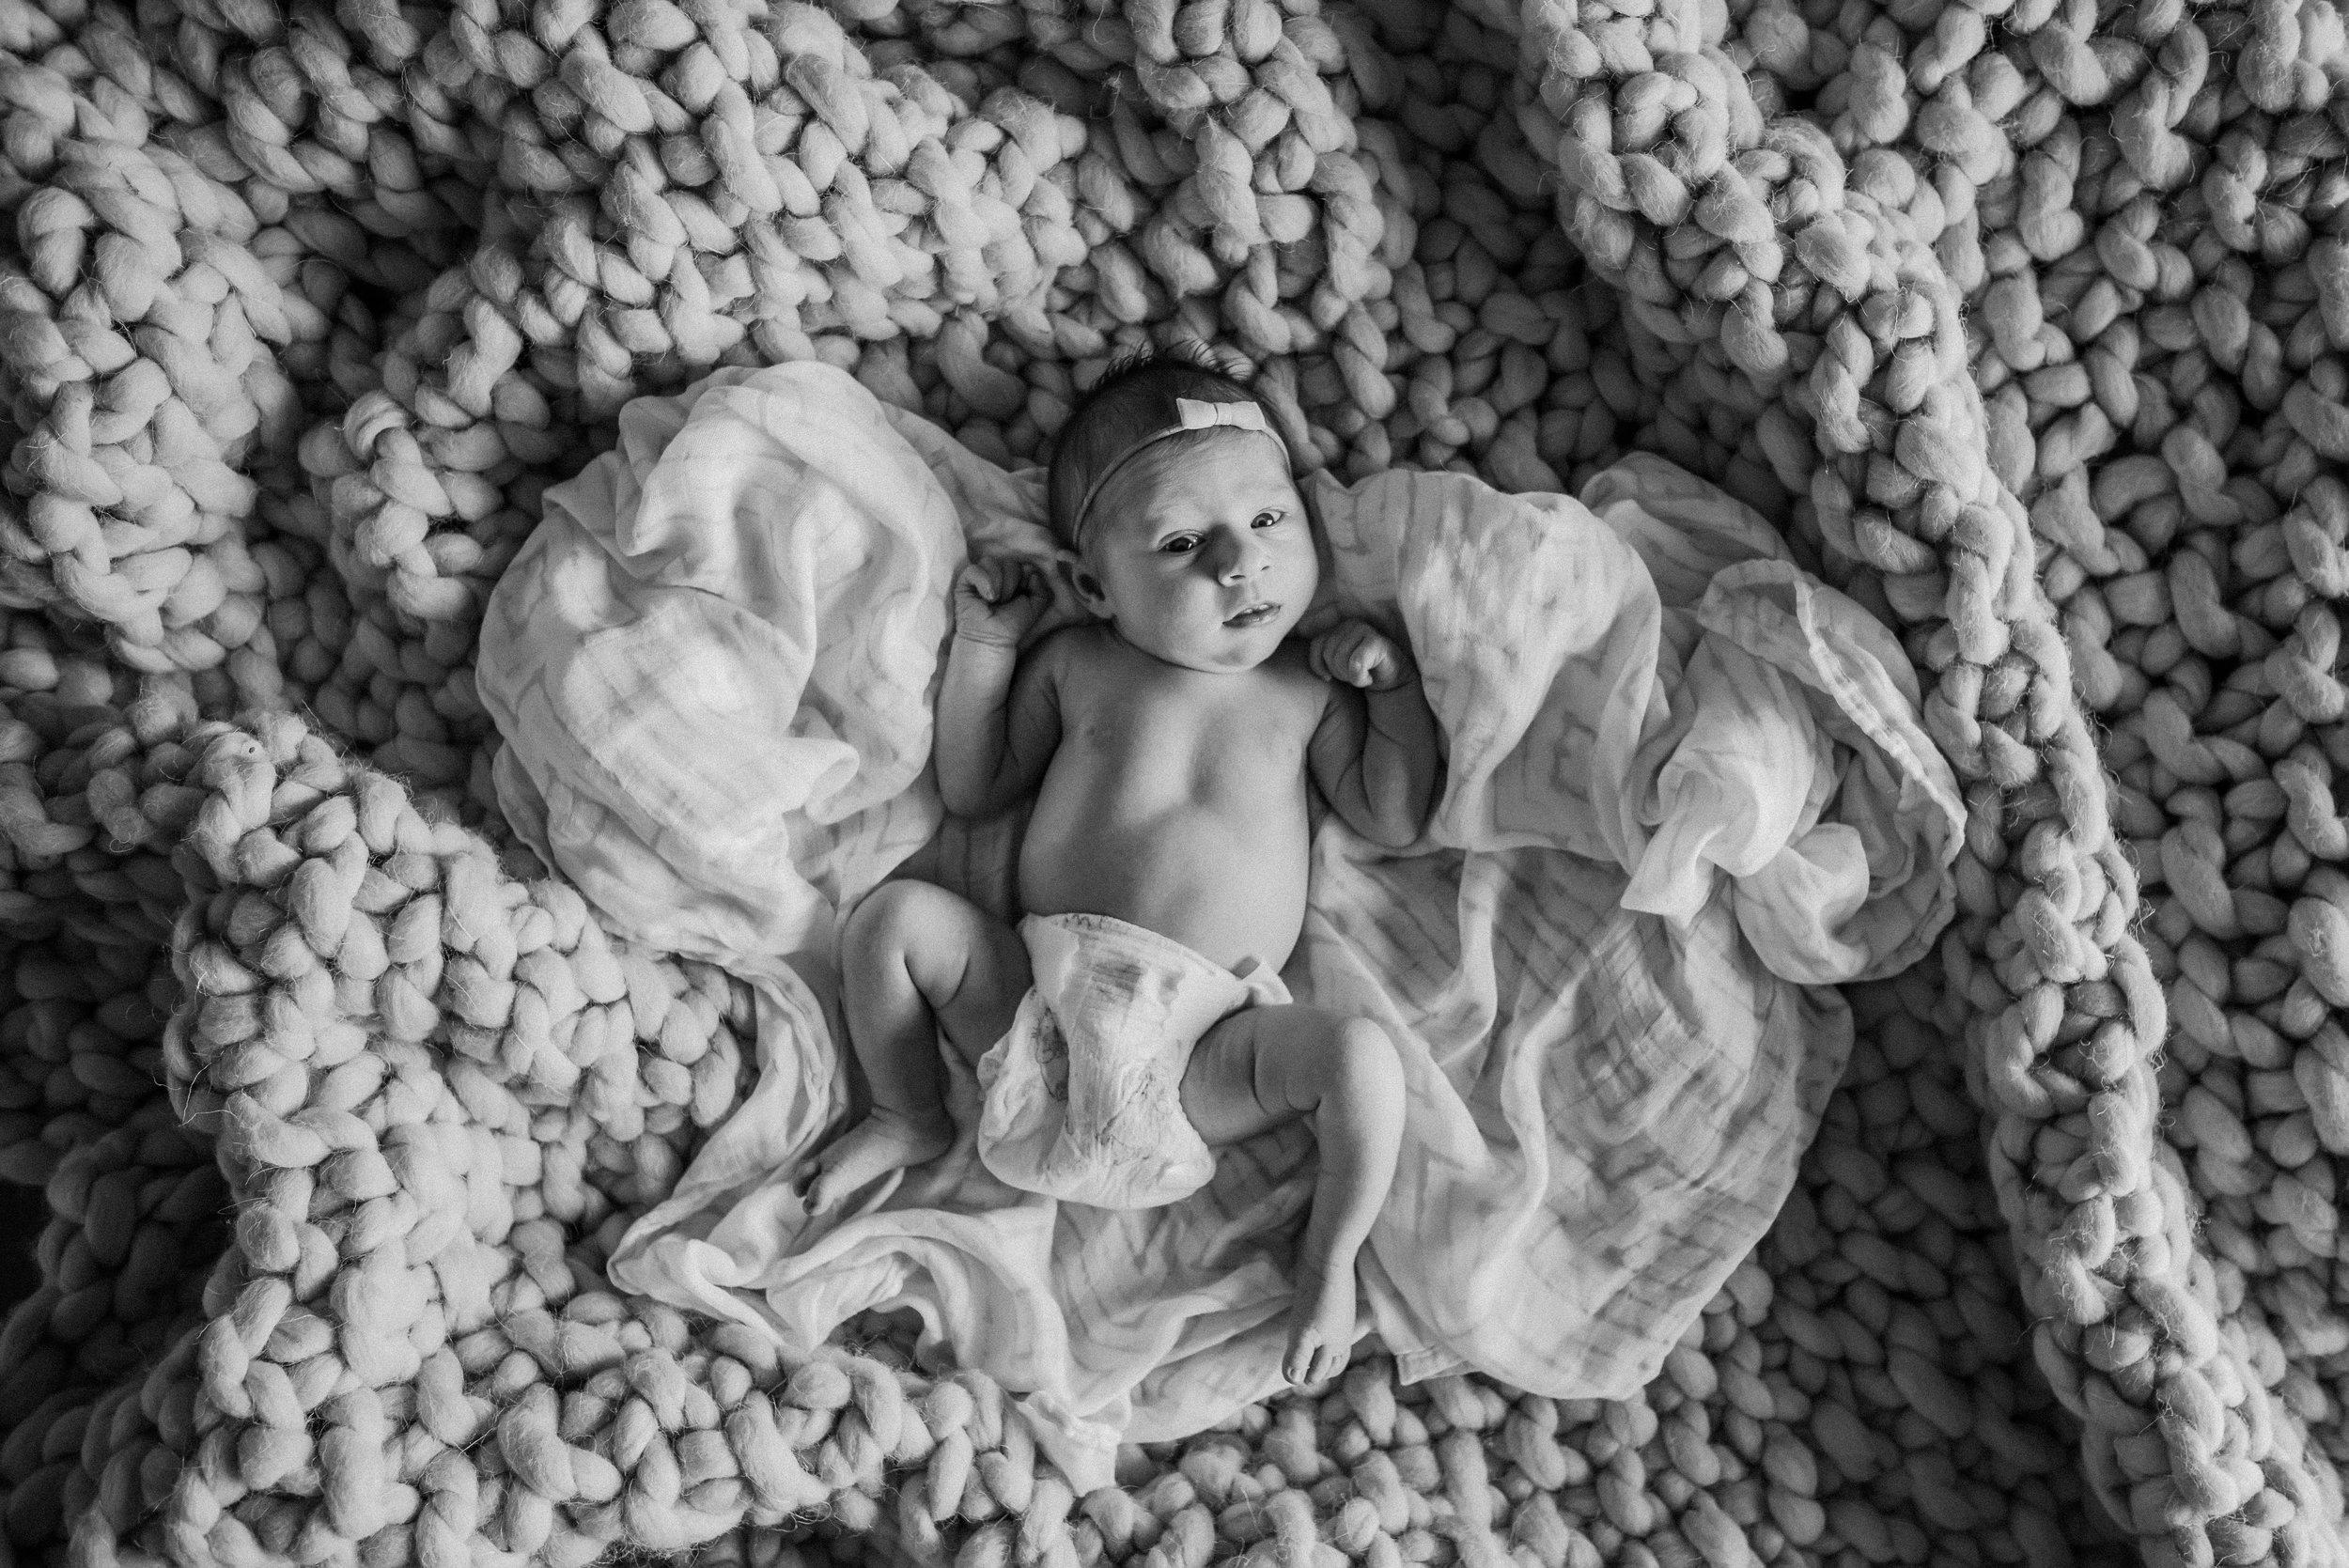 BabyCharlotte_StoriedPhotography-58.jpg